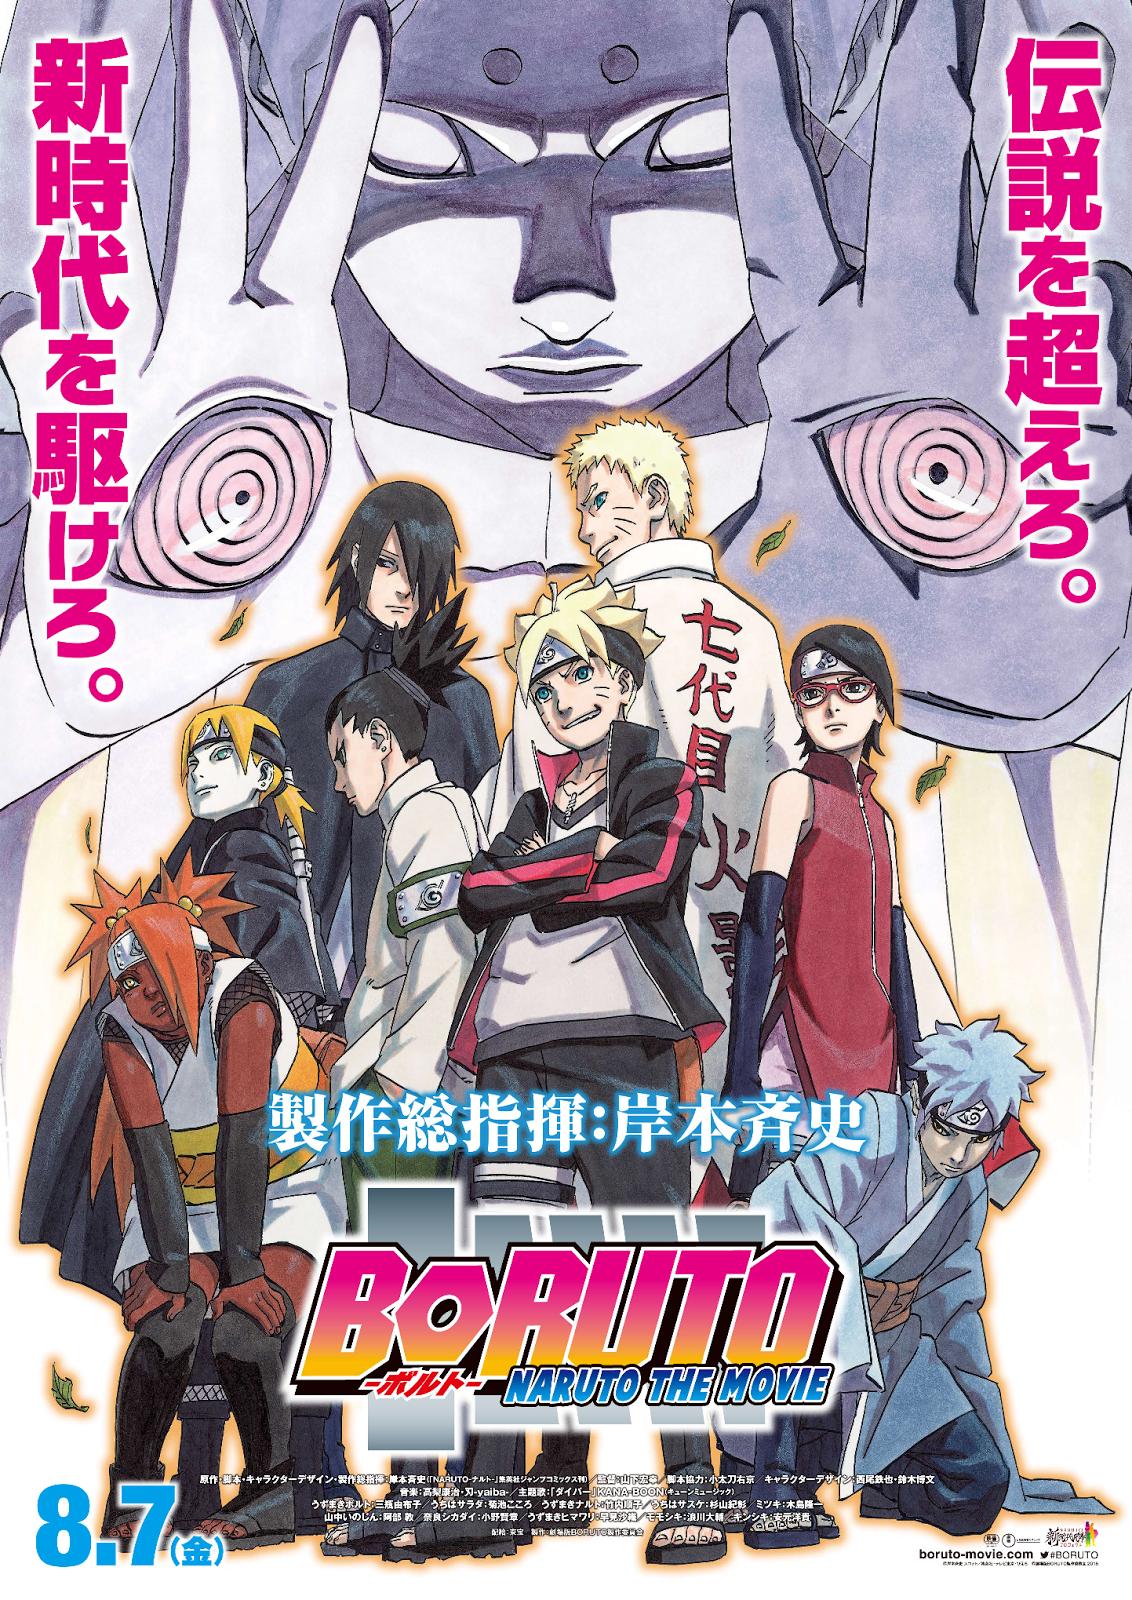 Nonton Boruto : Naruto Next Generations Episode 3 sub indo